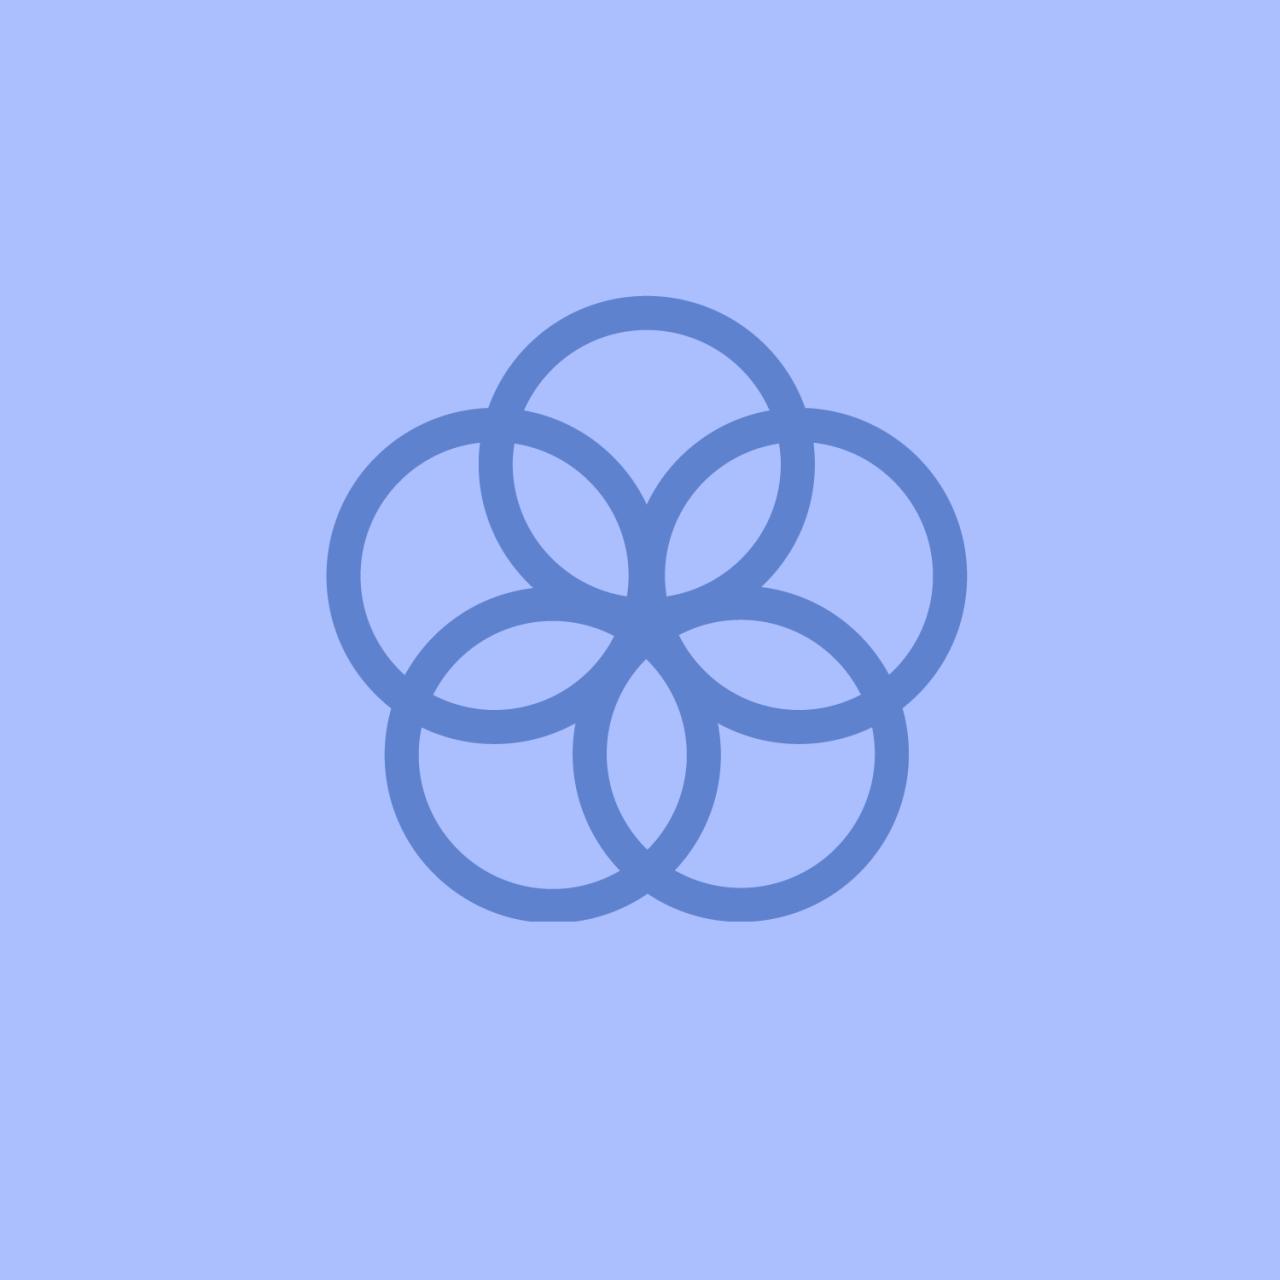 e-inverted-icons_web-17